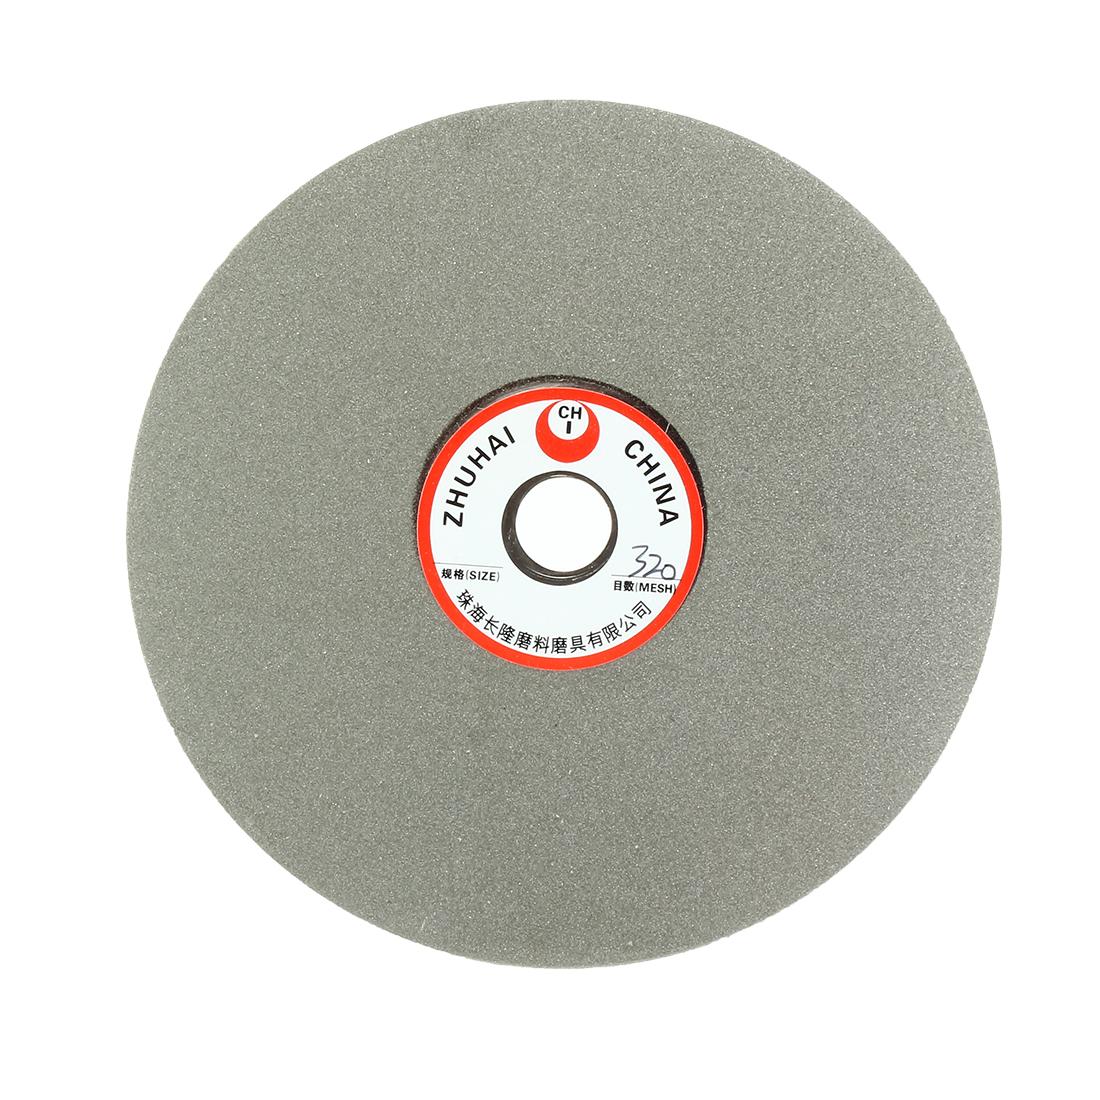 6-inch Grit 320 Diamond Coated Flat Lap Wheel Grinding Disc Polishing Tool